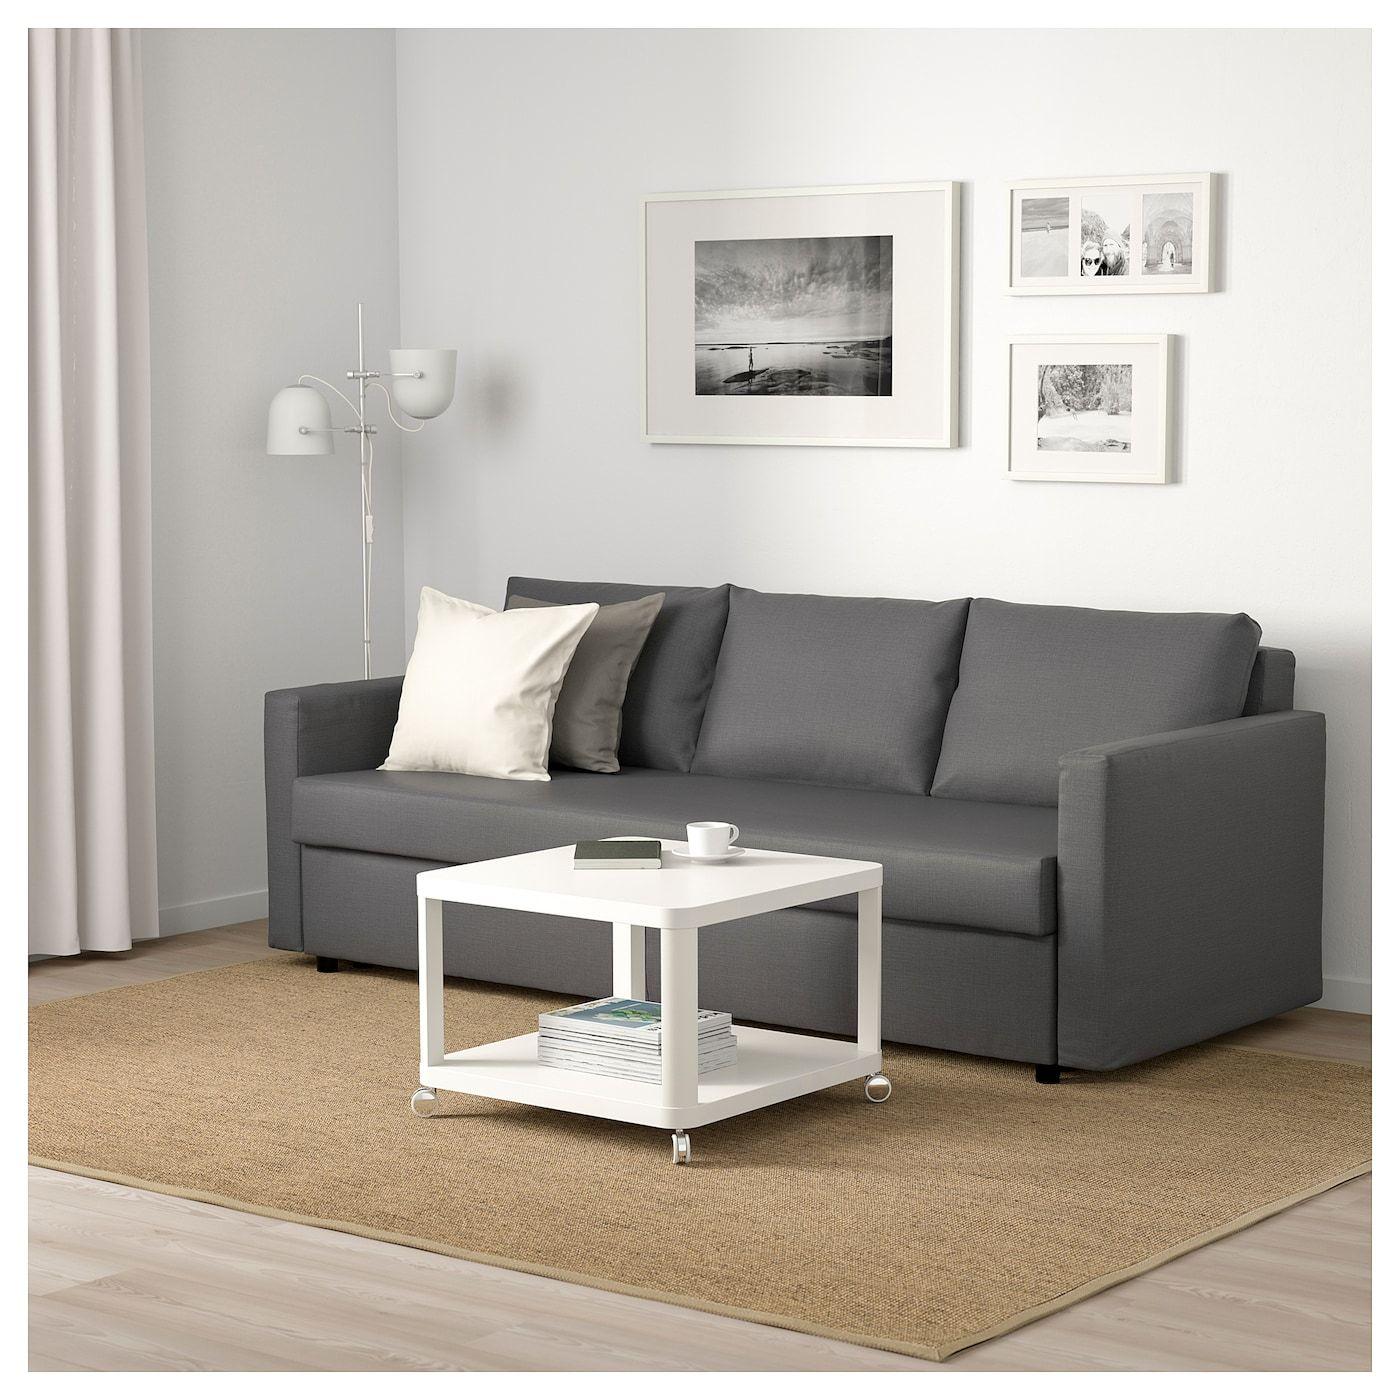 Friheten Sleeper Sofa Skiftebo Dark Gray In 2019